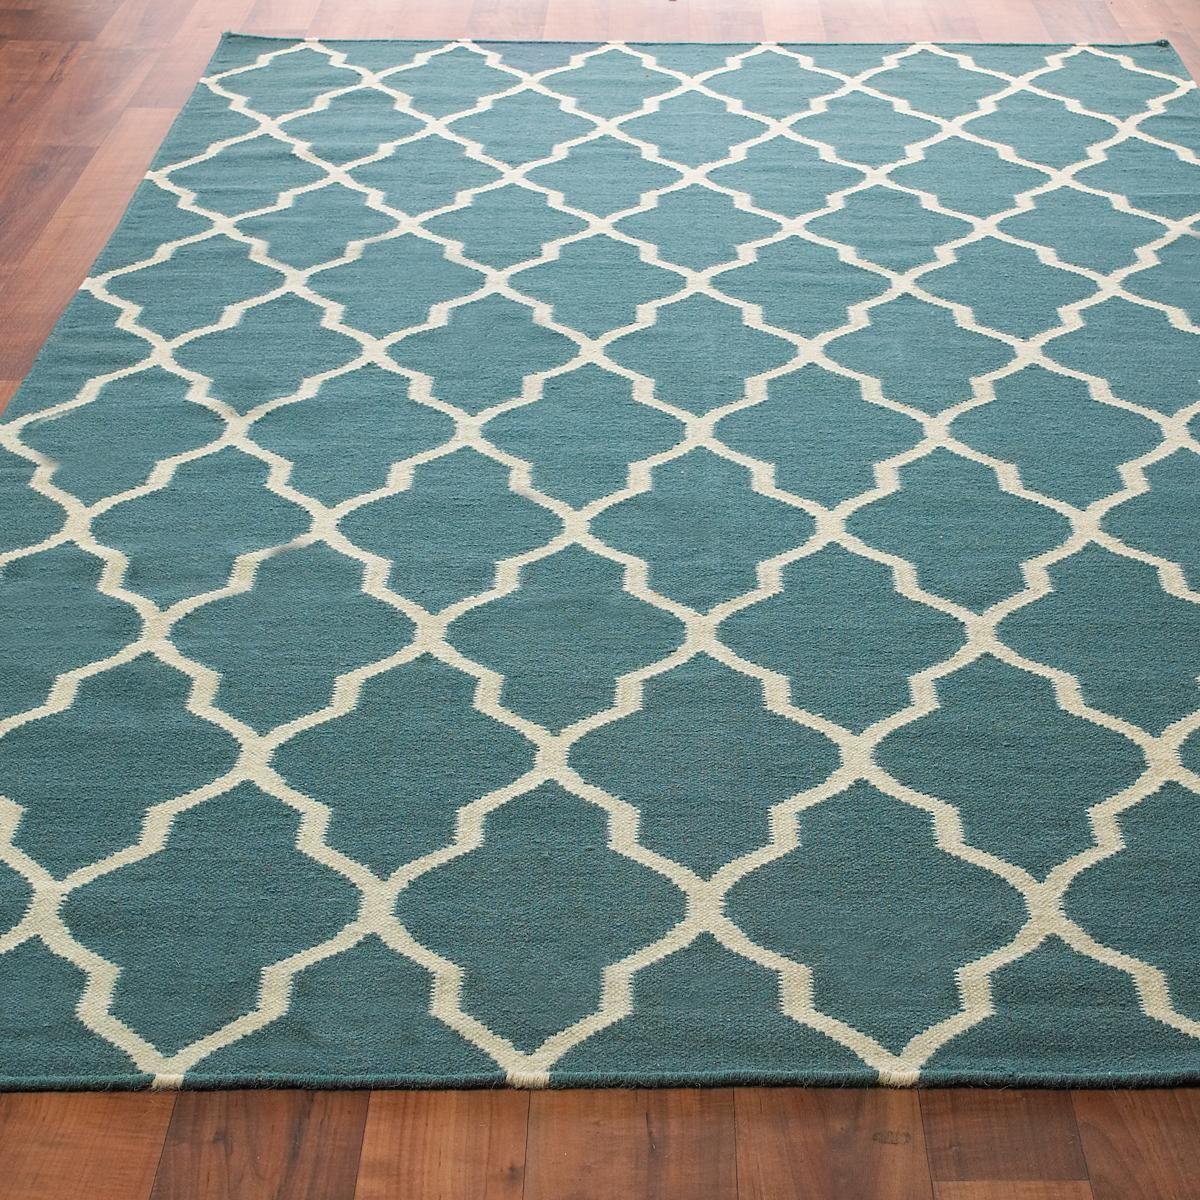 Rug With Turquoise Sofa: Diamond Trellis Dhurrie Rug